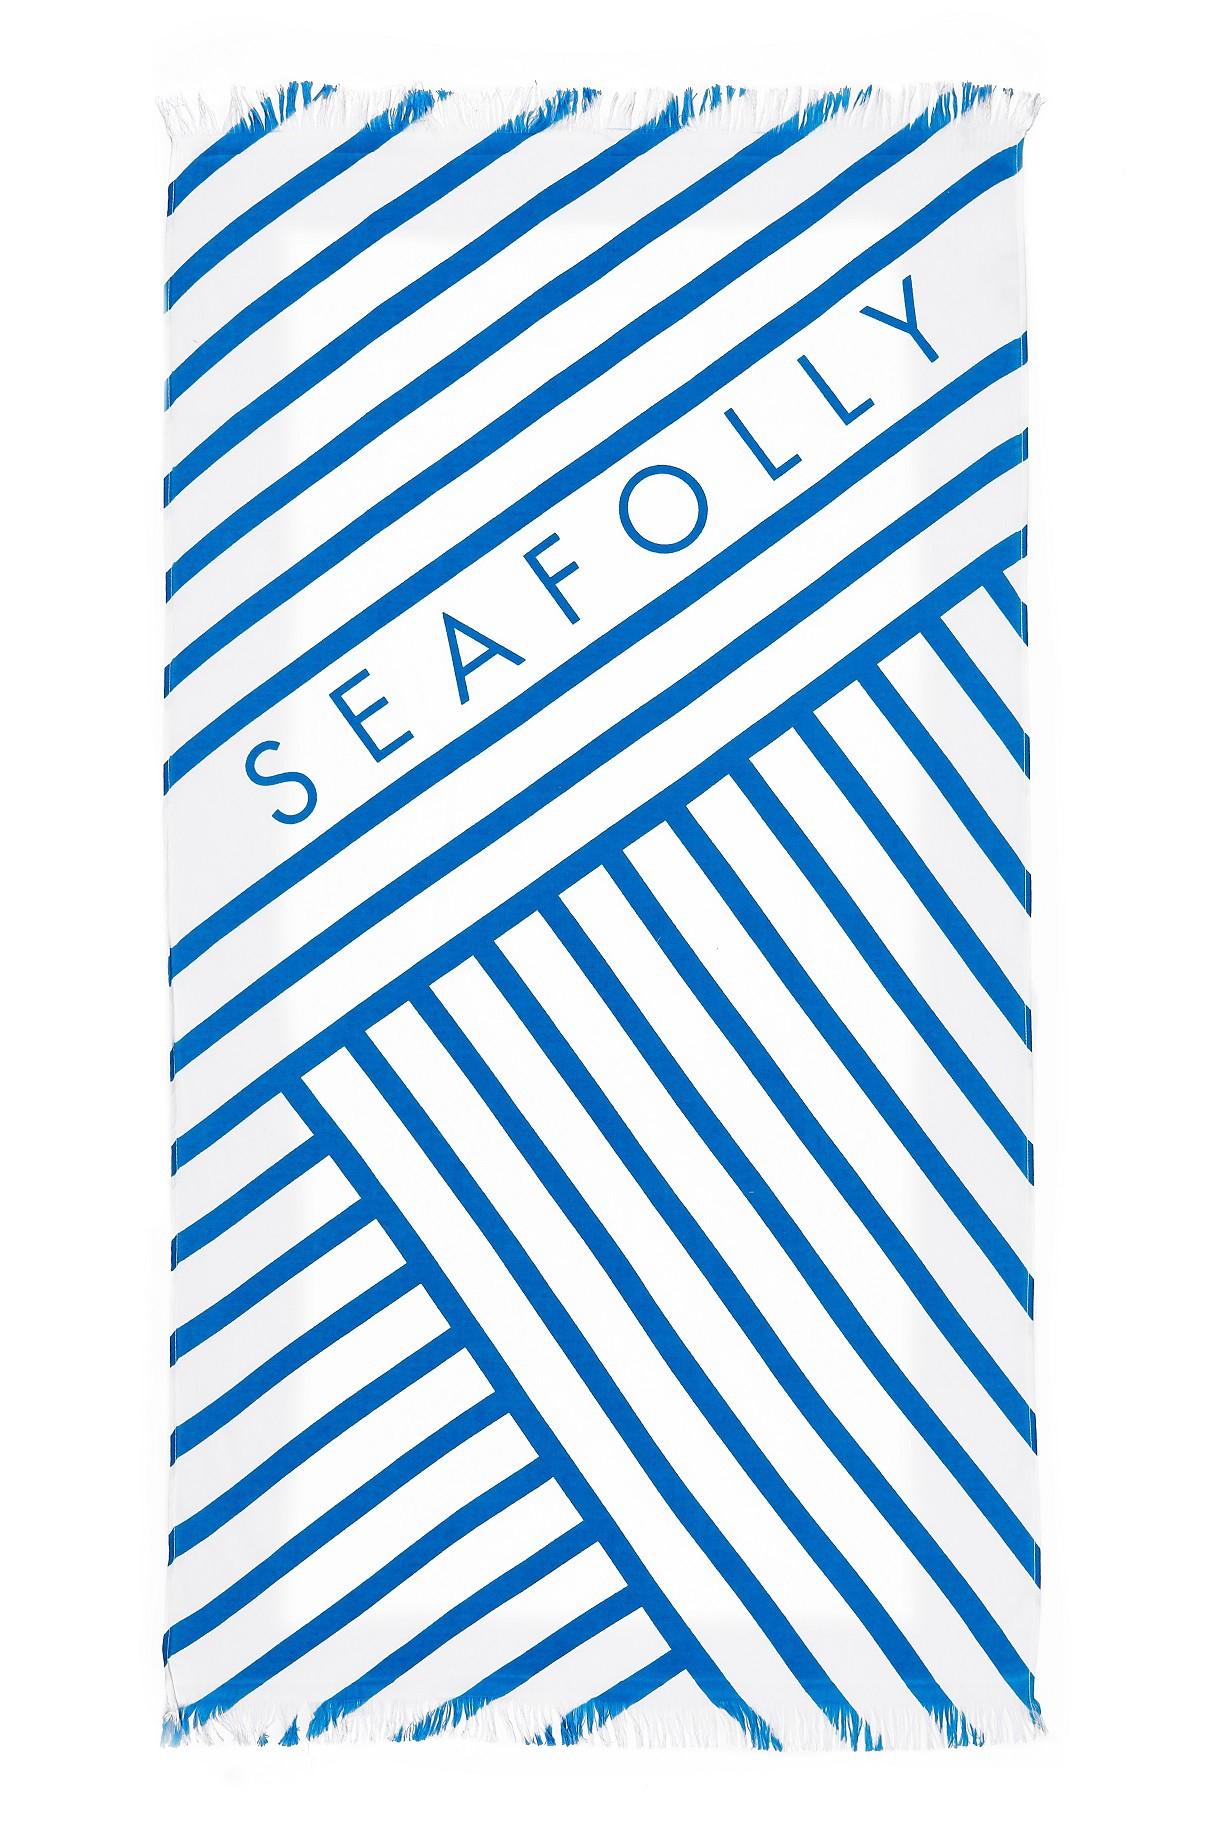 Törülköző Seafolly Angled Stripe Beach Electric Blue